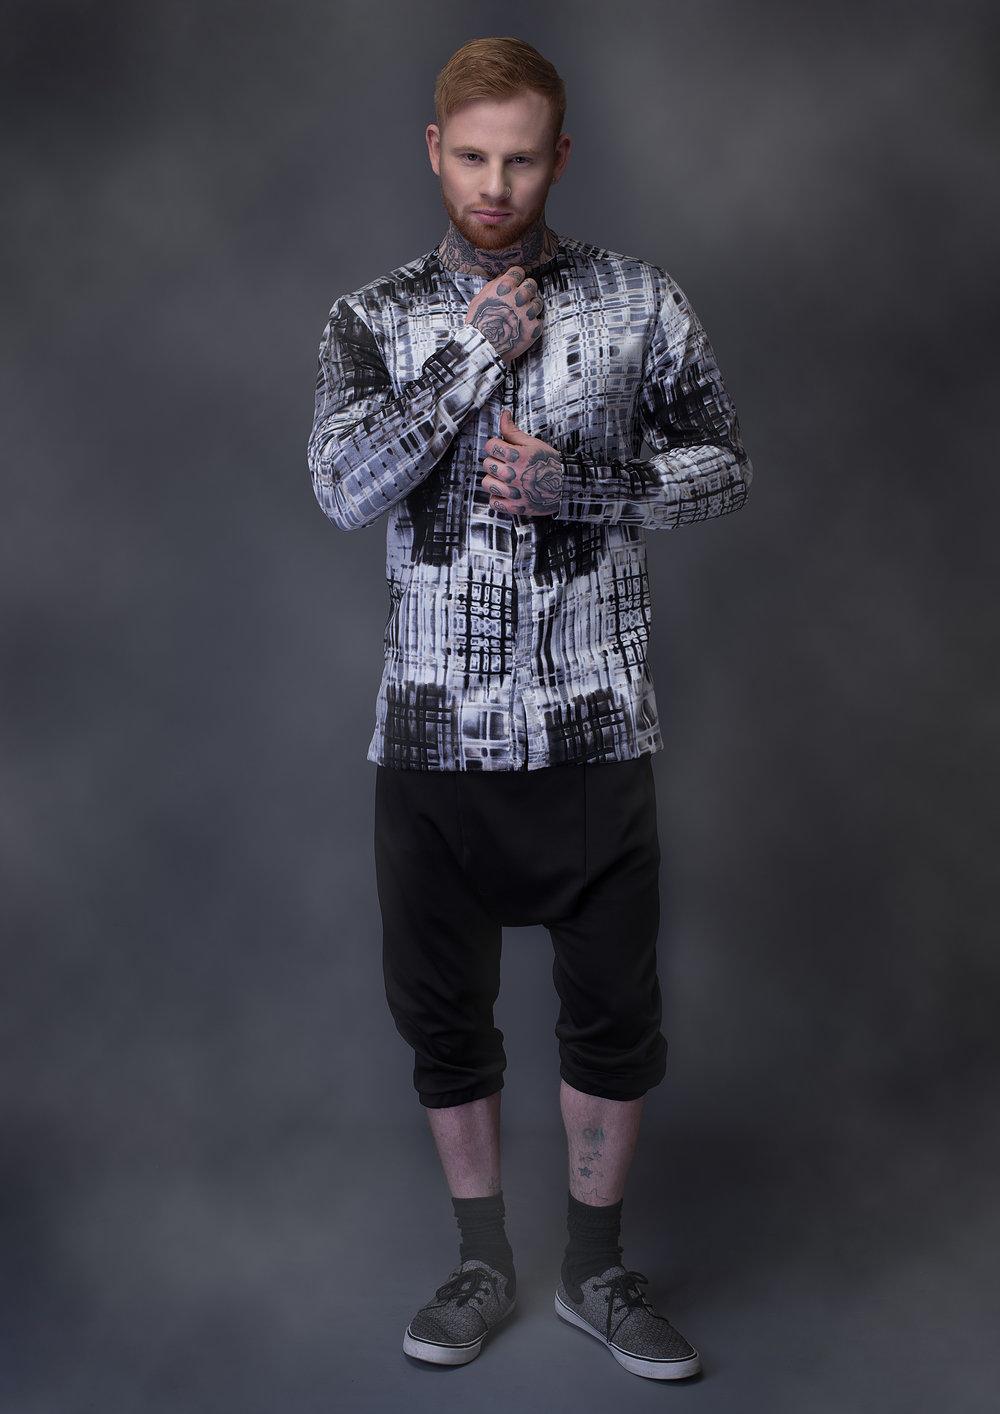 zaramia-ava-zaramiaava-leeds-fashion-designer-leedsfashiondesigner-stylist-leeds-stylist-leedsstylist-ethical-sustainable-minimalist-versatile-drape-eito-hareem-trouser-shorts-black-ren-13